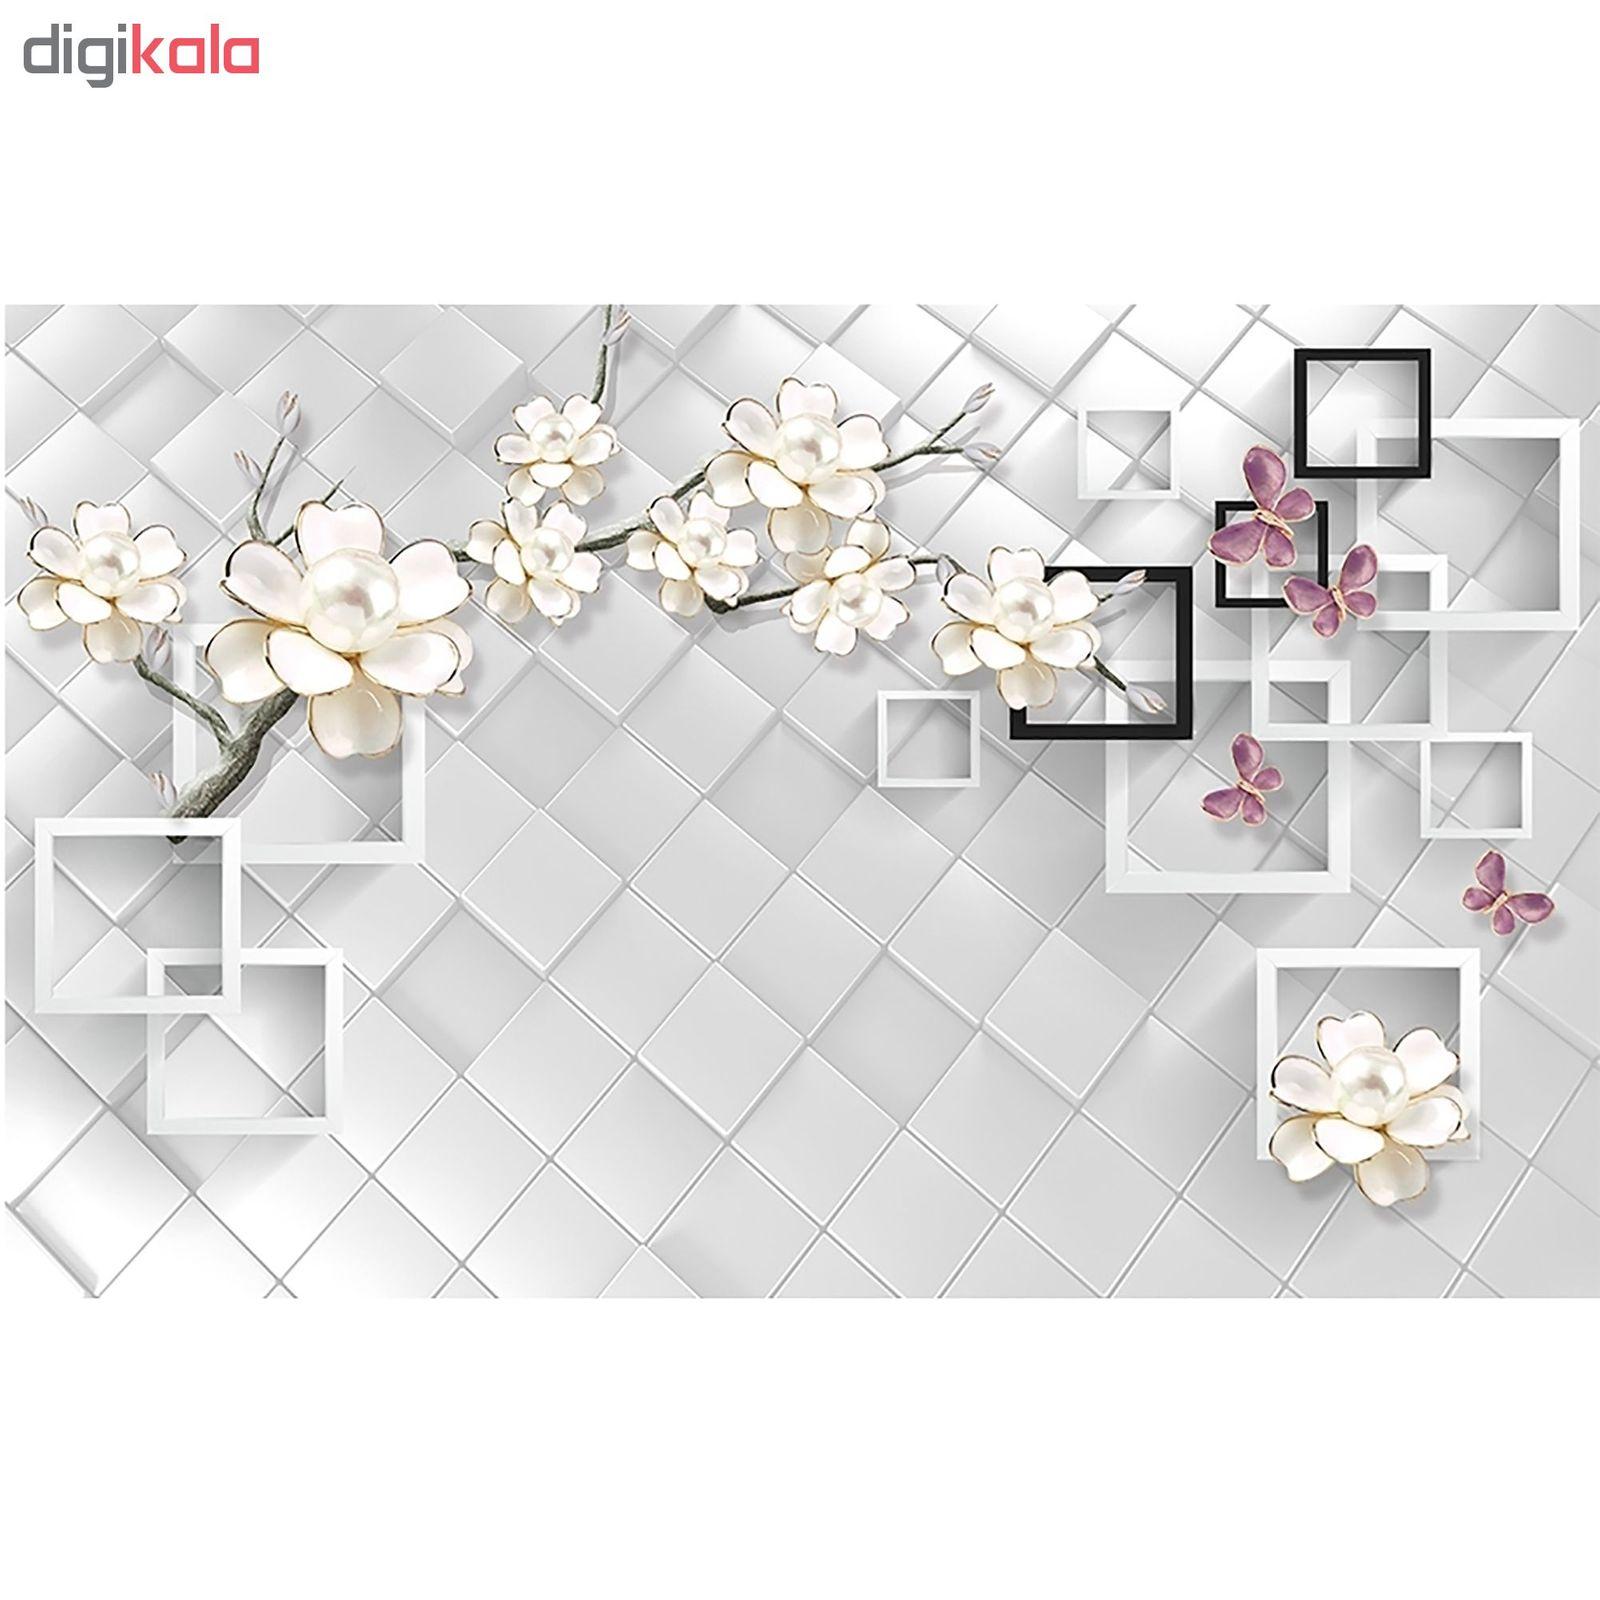 پوستر دیواری سه بعدی کد 16416043 main 1 4